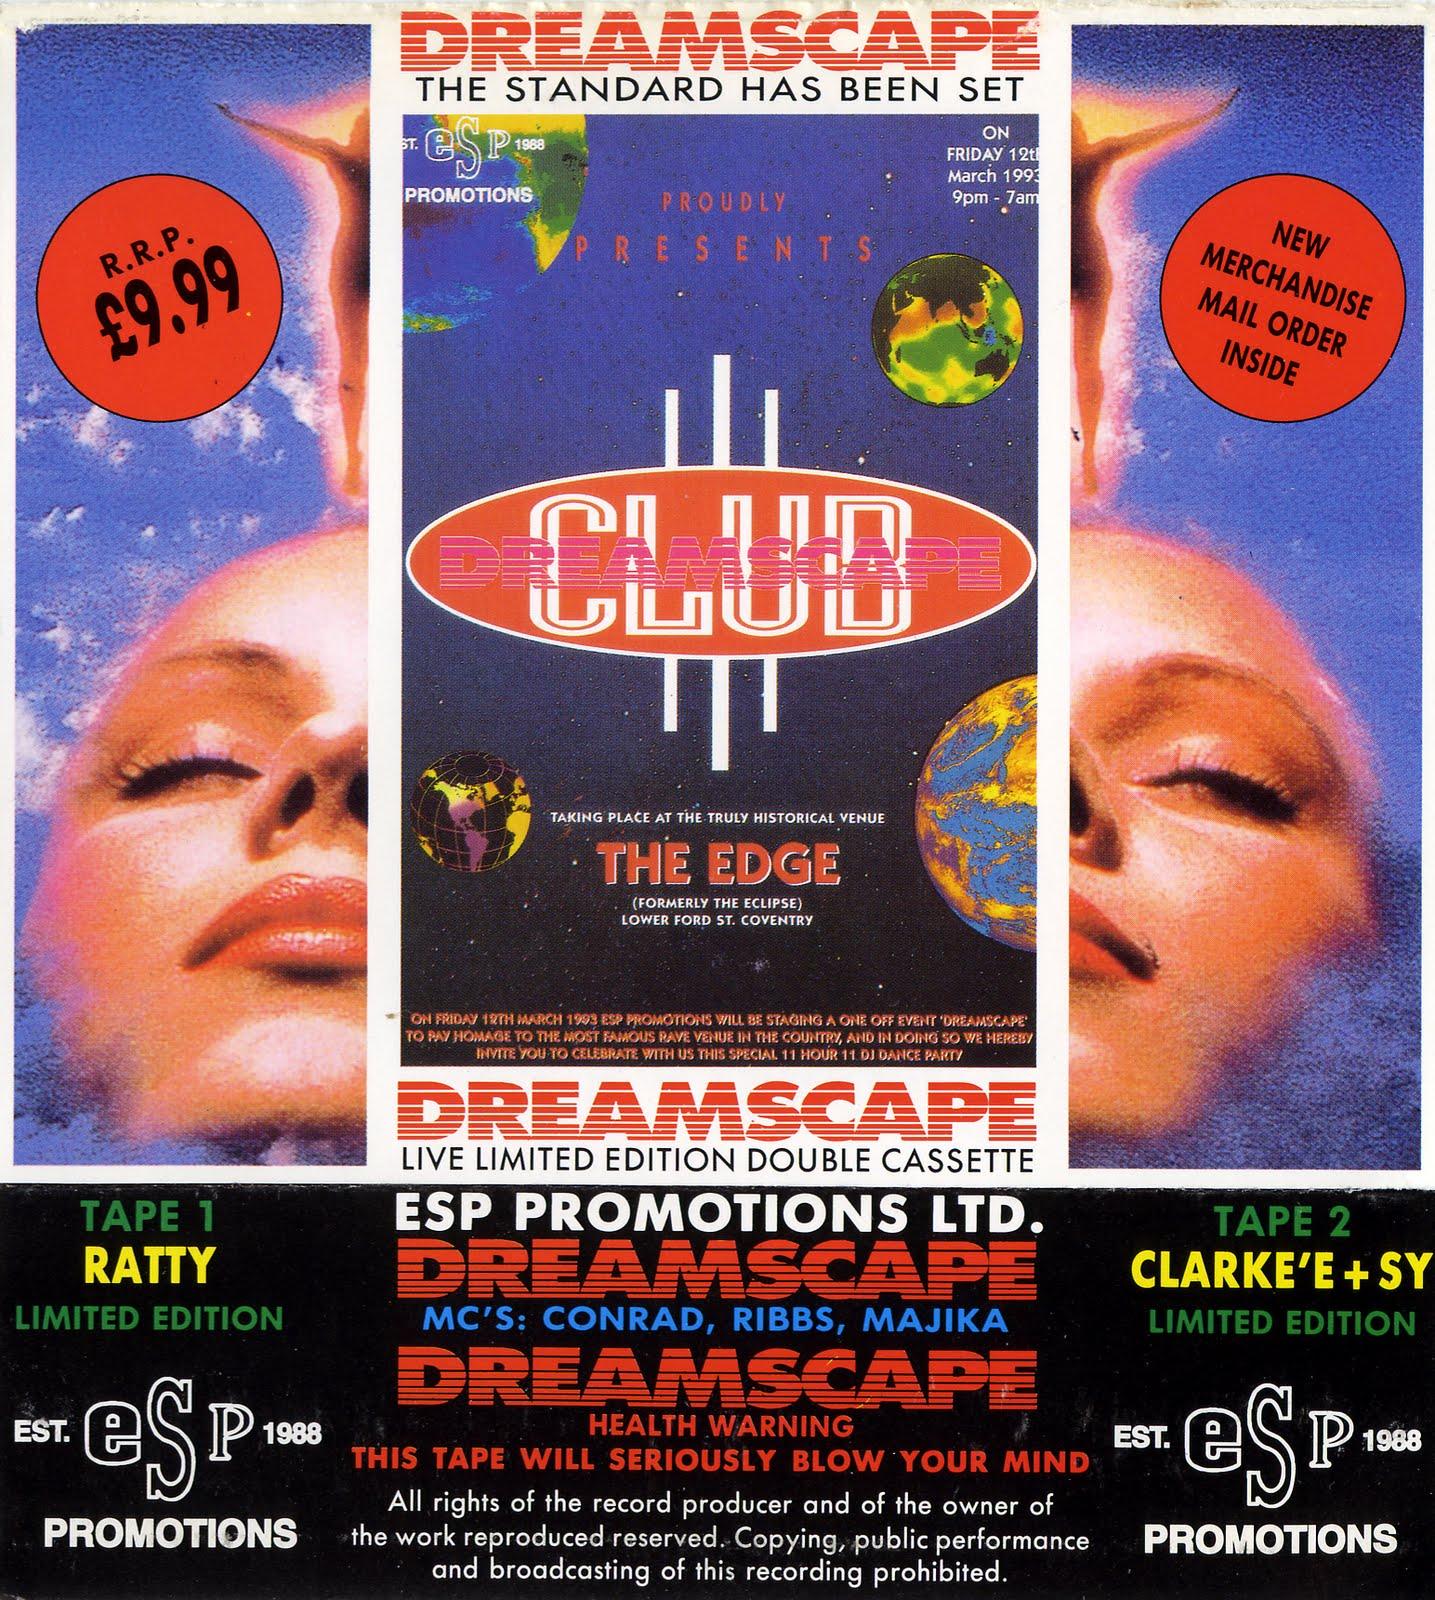 DJ Clarkee* Clarkee - Helter Skelter 10th August 1996